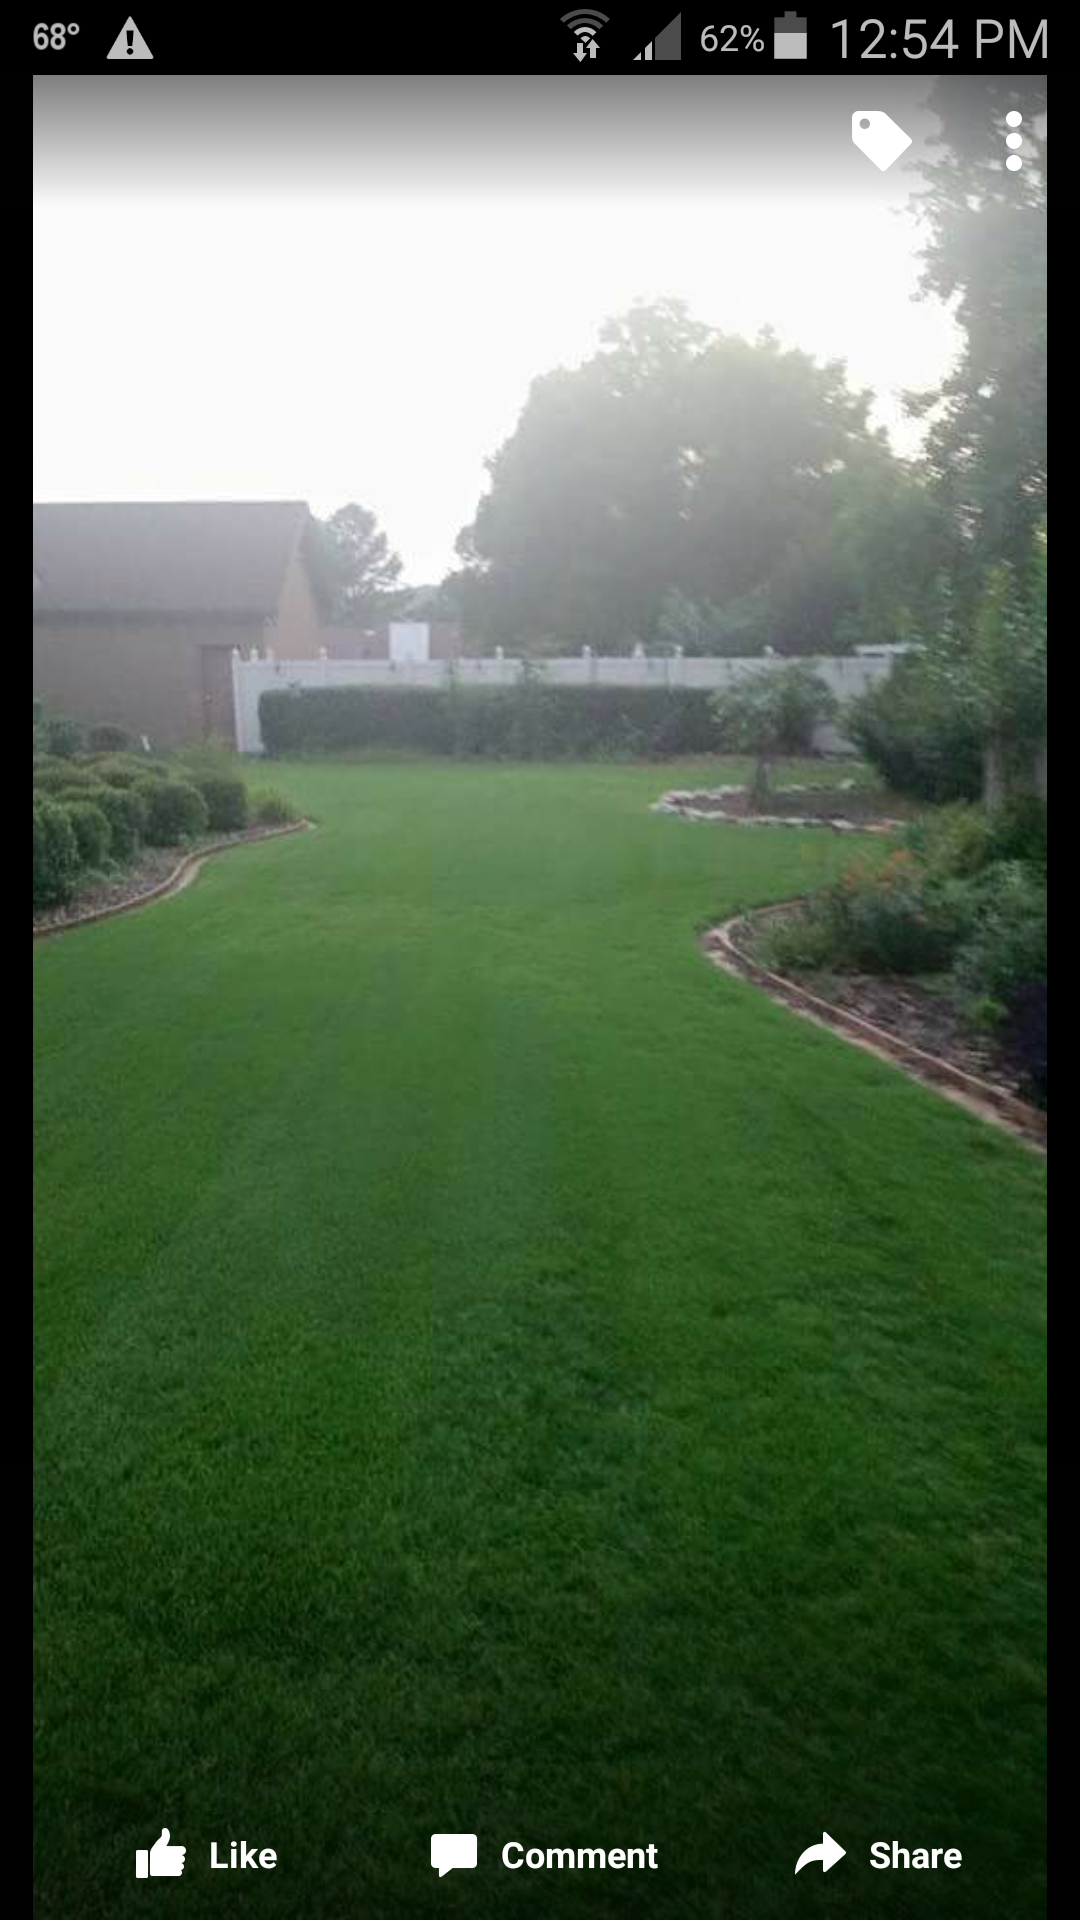 Harrell Lawn Care Services, LLC 2714 Willena Dr SE